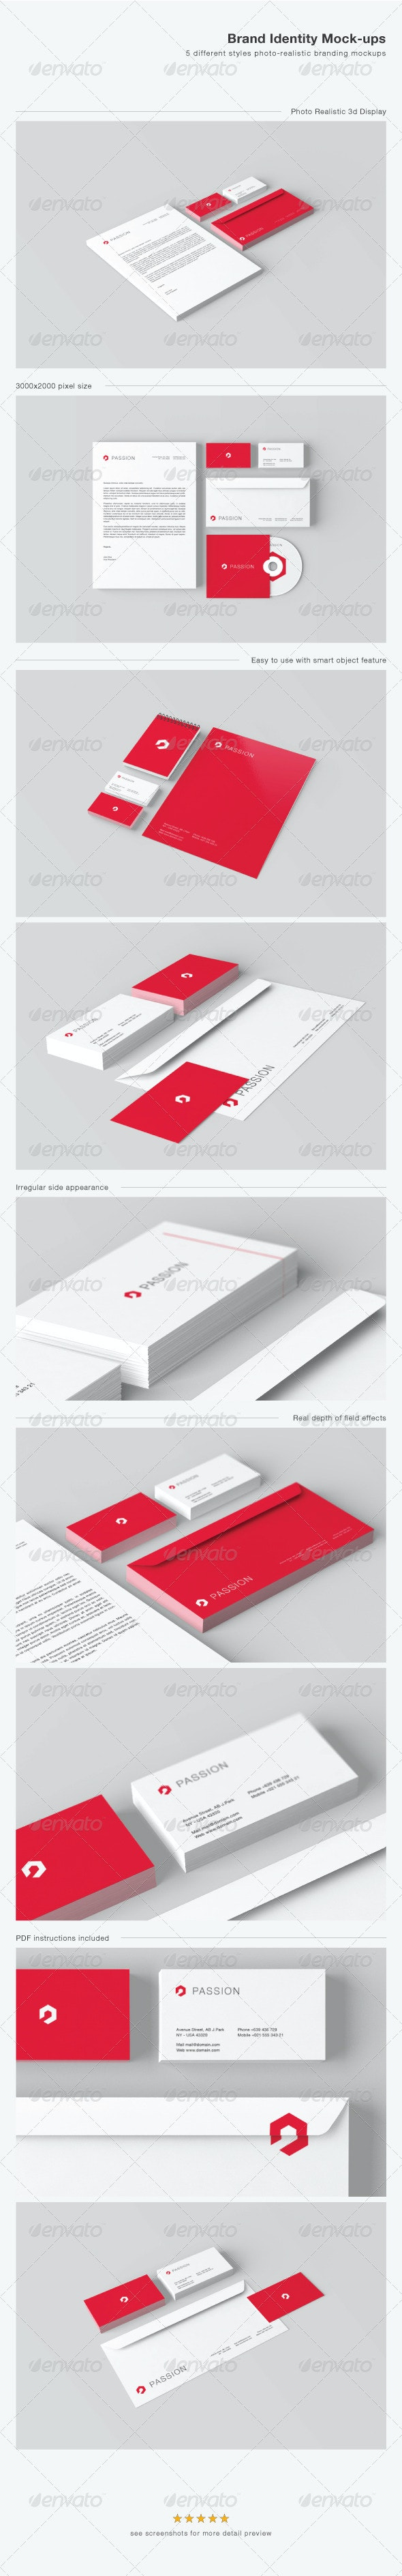 Stationery / Brand Identity Mock-ups - Print Product Mock-Ups